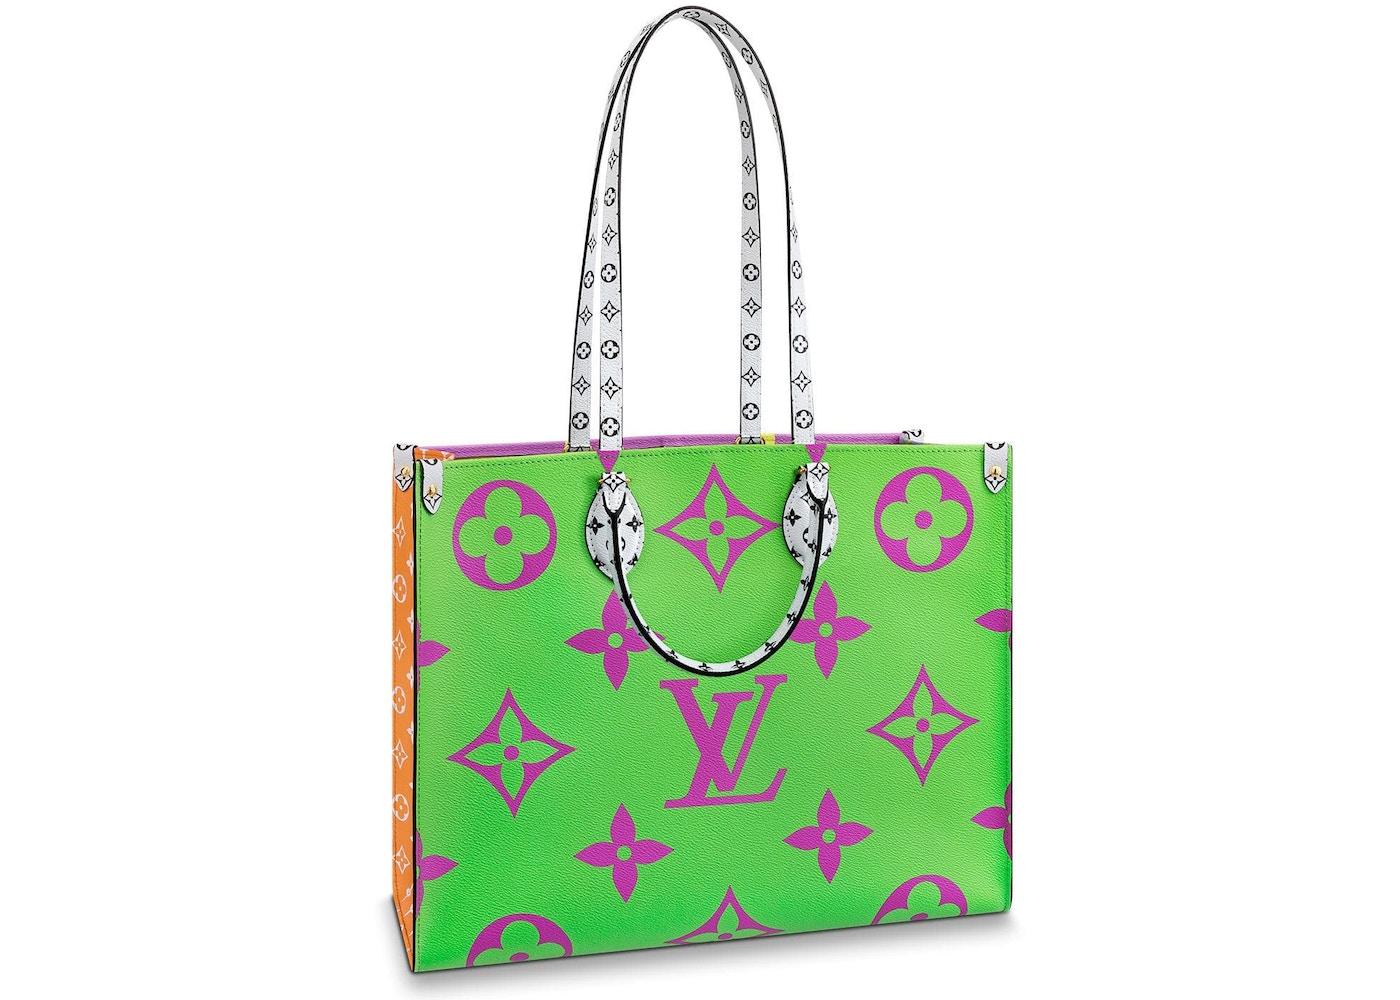 3596dde0dc Louis Vuitton Onthego Monogram Giant Green/Lilac